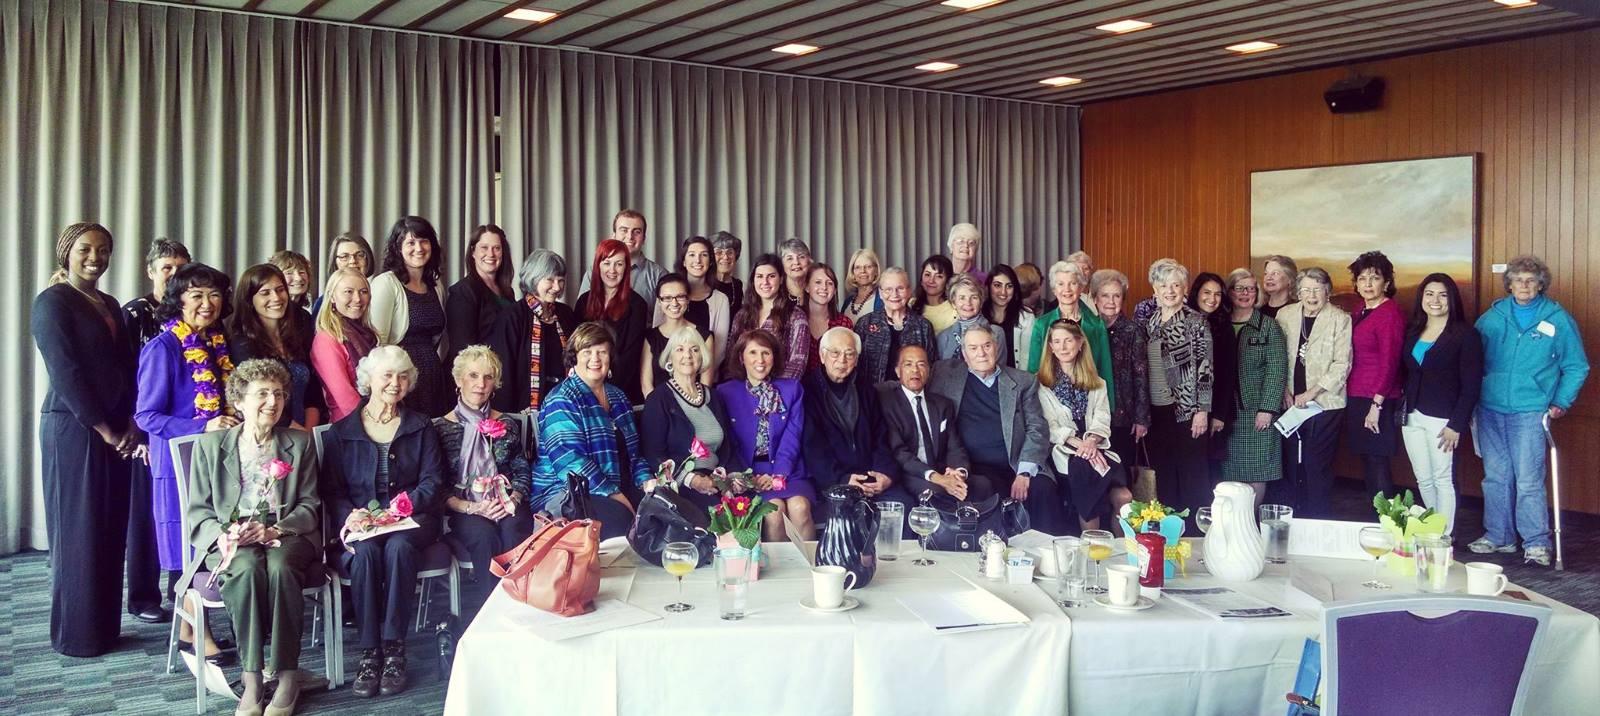 2014 meeting photo